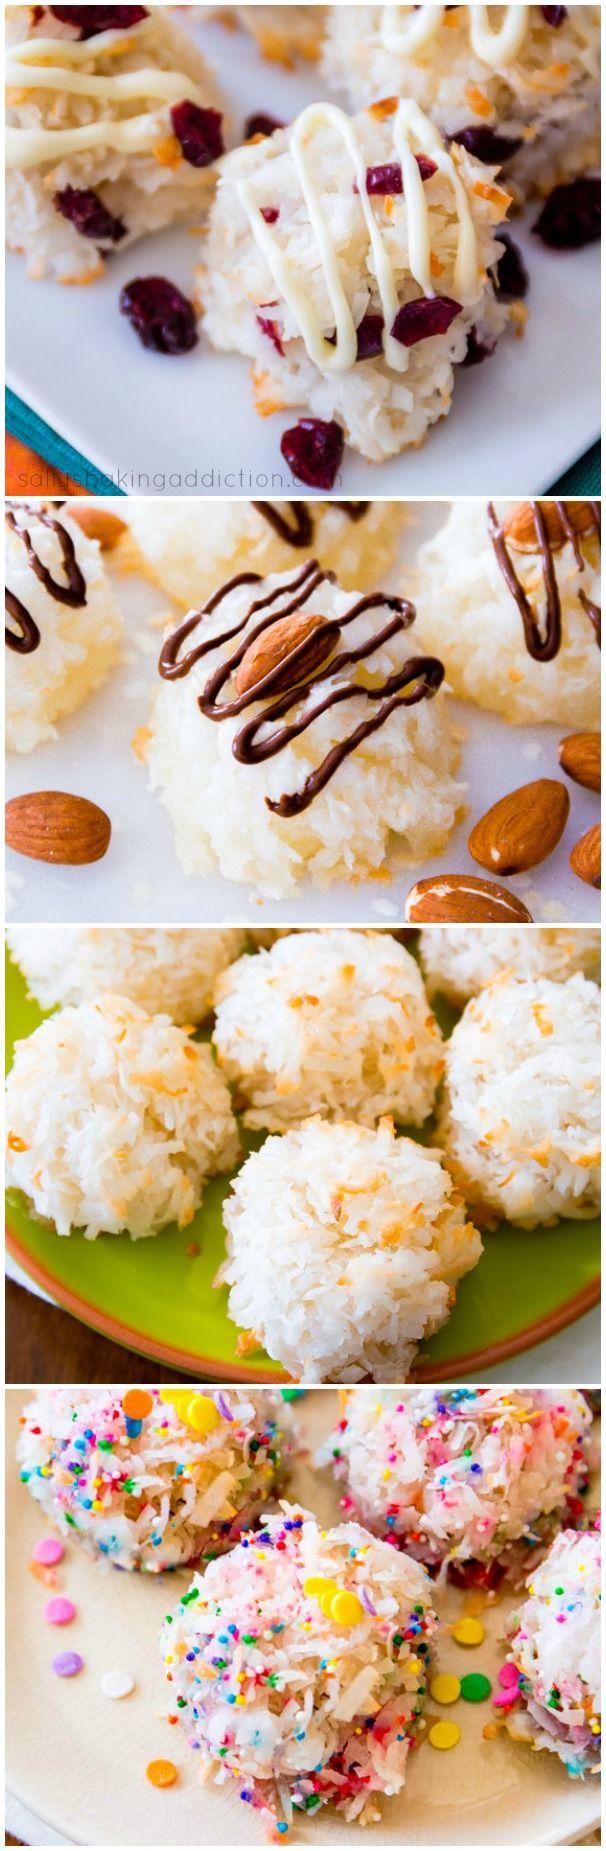 My favorite chewy, moist coconut macaroon recipe! Enjoy them with white chocolate, dark chocolate, sprinkles, or plain.